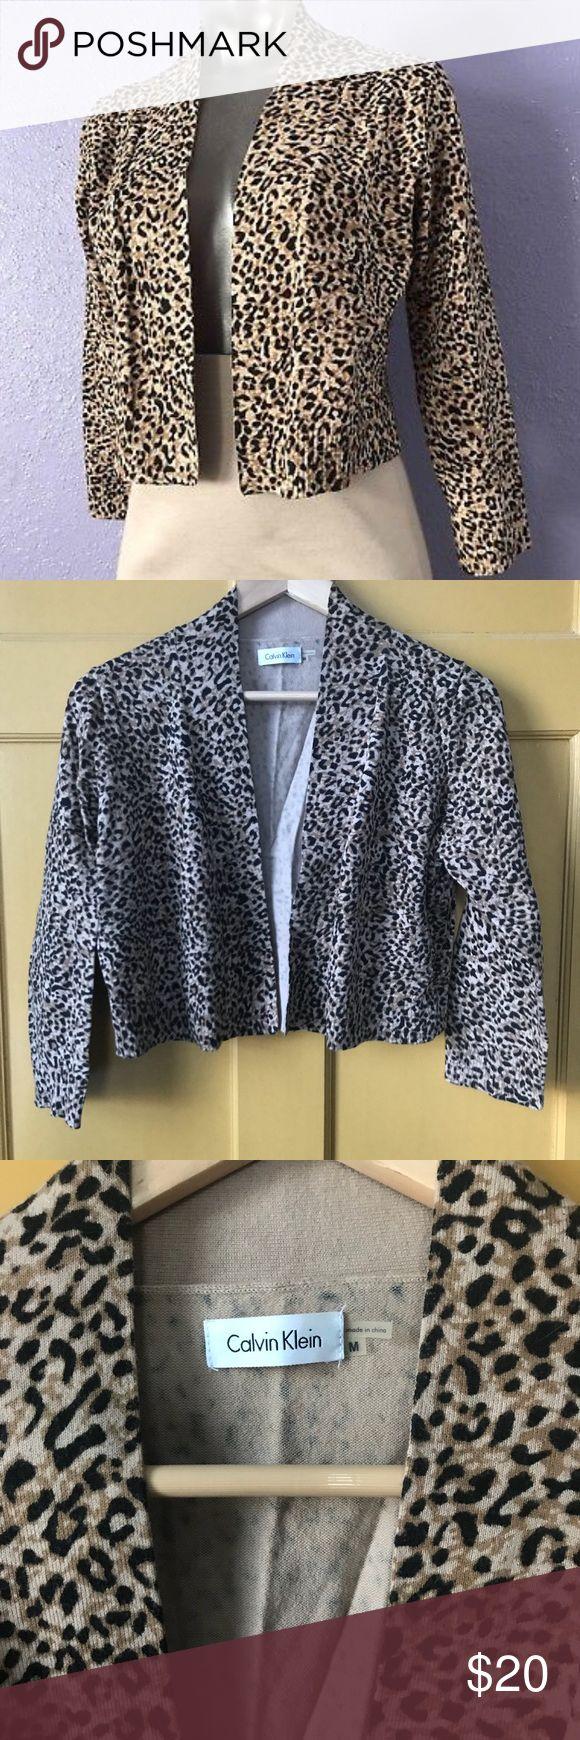 Calvin Klein Cheetah Print shrug EUC Size medium Calvin Klein Sweaters Shrugs & Ponchos